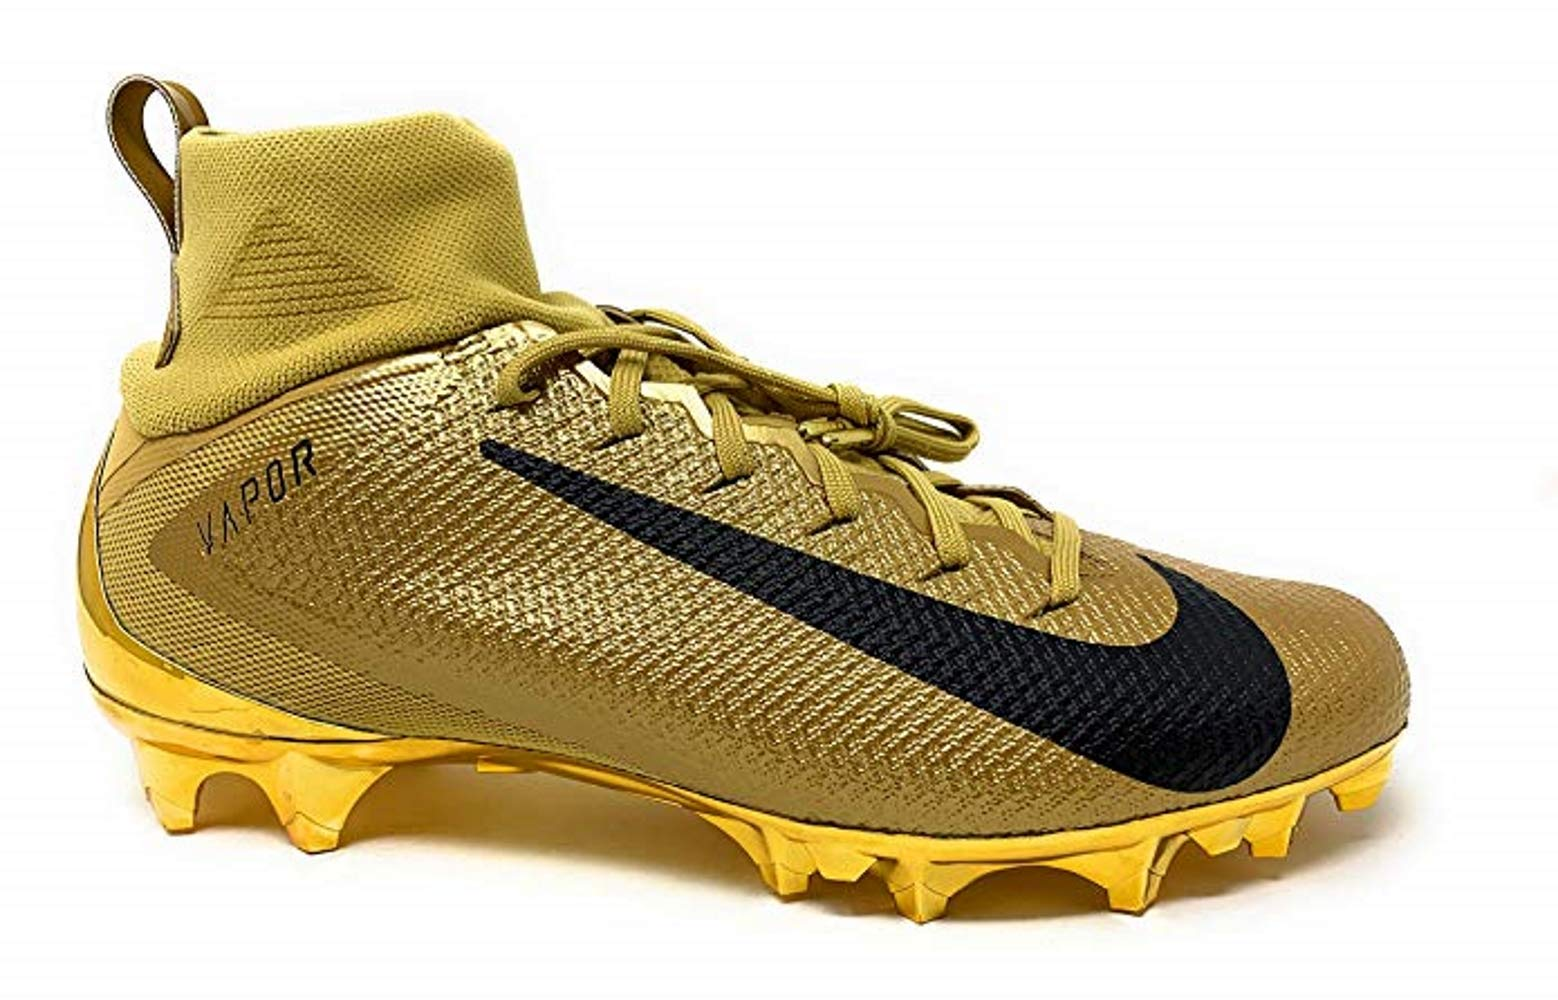 Nike Vapor Untouchable Pro 3 Mens 917165-700 (Club Gold/Metallic Gold, 8 US)